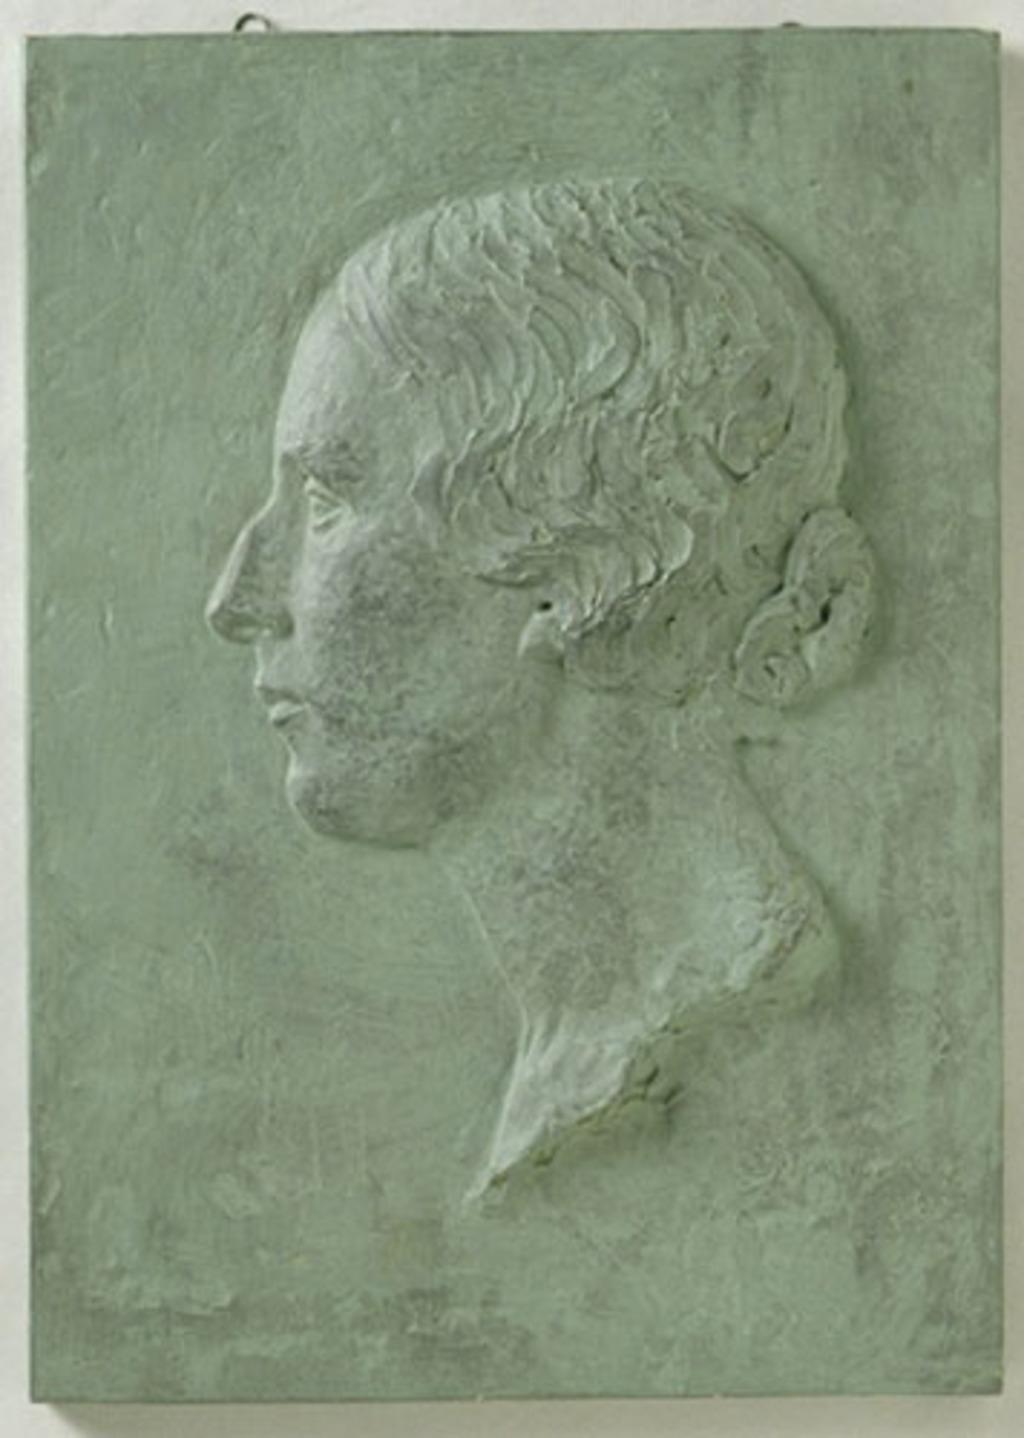 Madame Jean-Baptiste Soucy